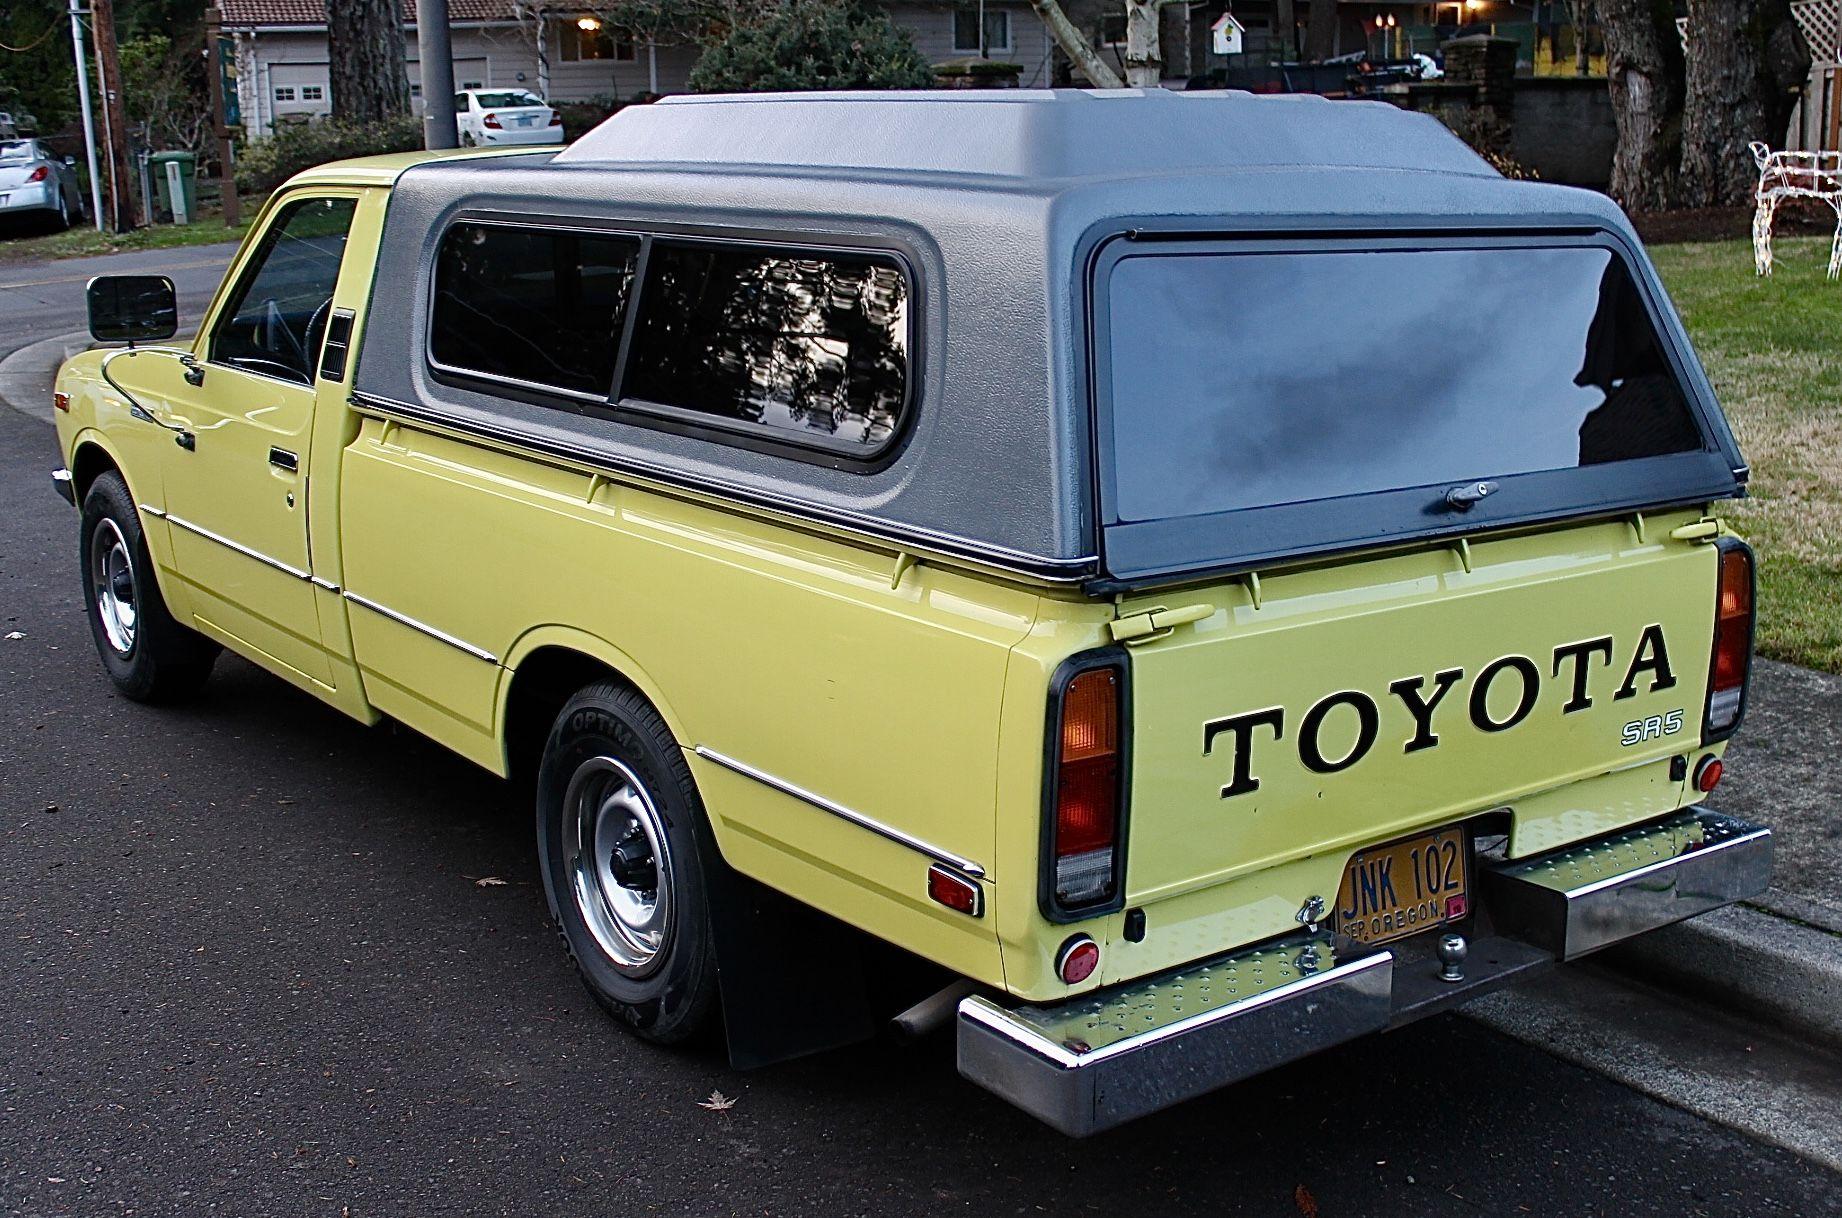 1977 Toyota Pickup Sr5 Longbed Toyota Classic Cars Classic Cars Online